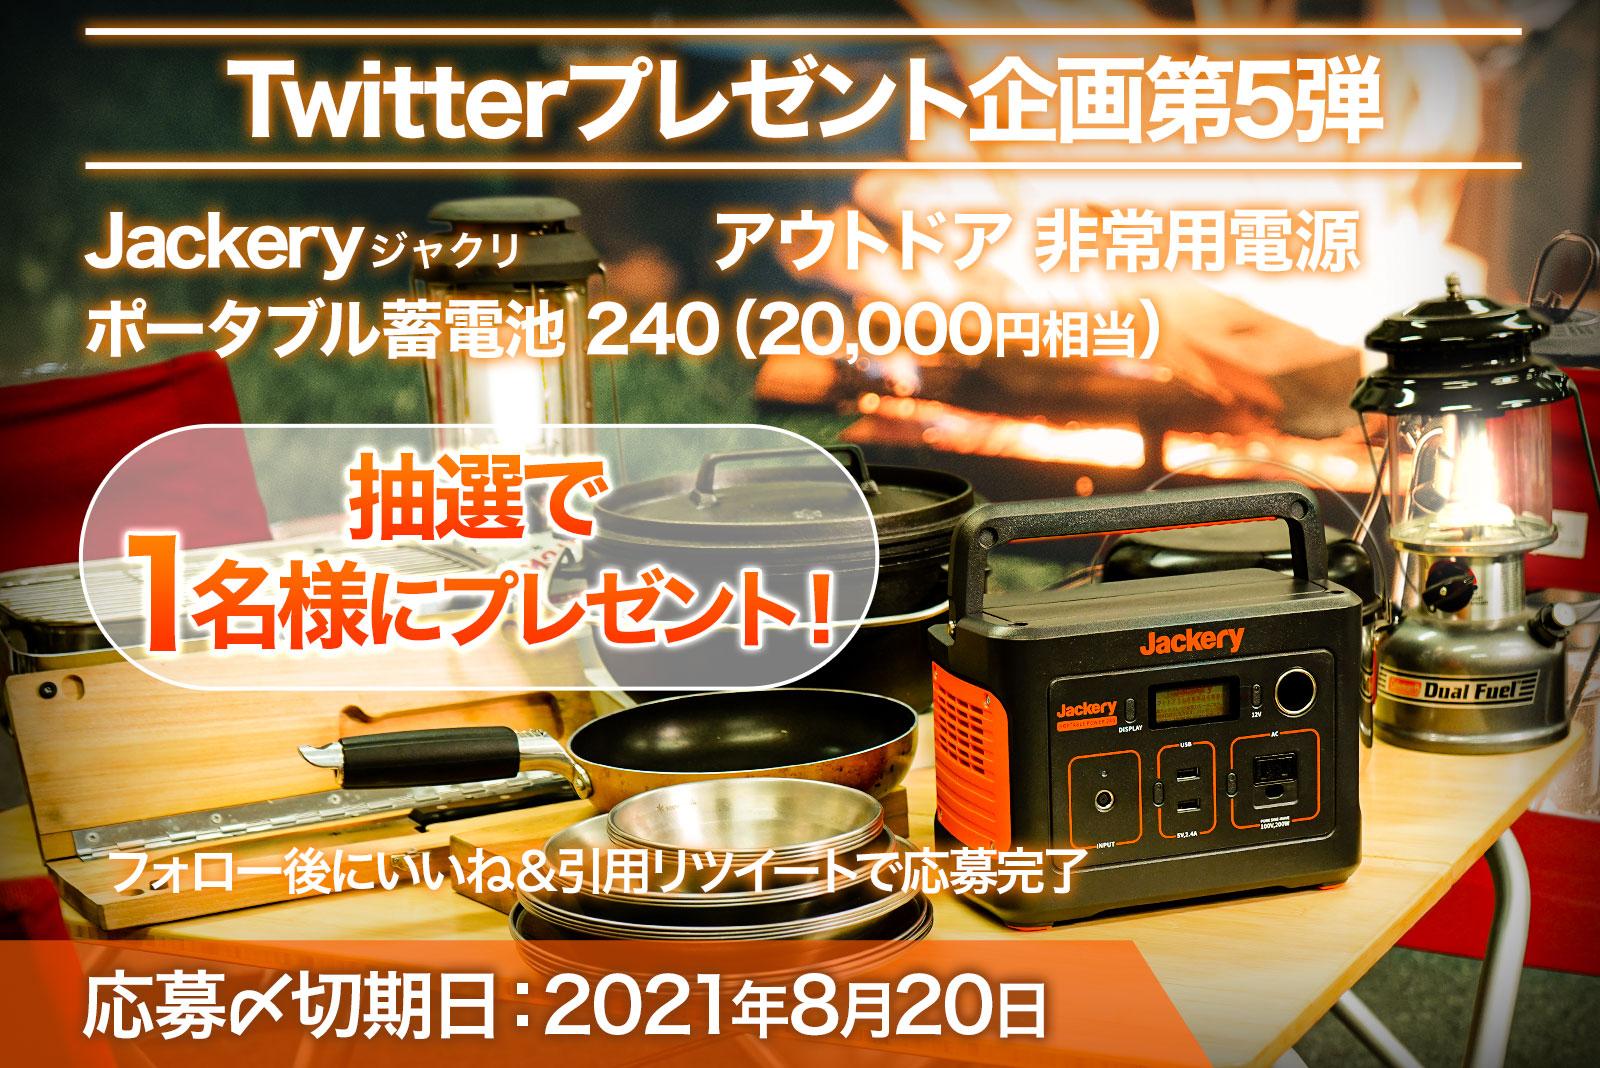 【twitterプレゼント企画第5弾】2万円相当のポータブル電源が当たる!8月20日(金)応募〆切